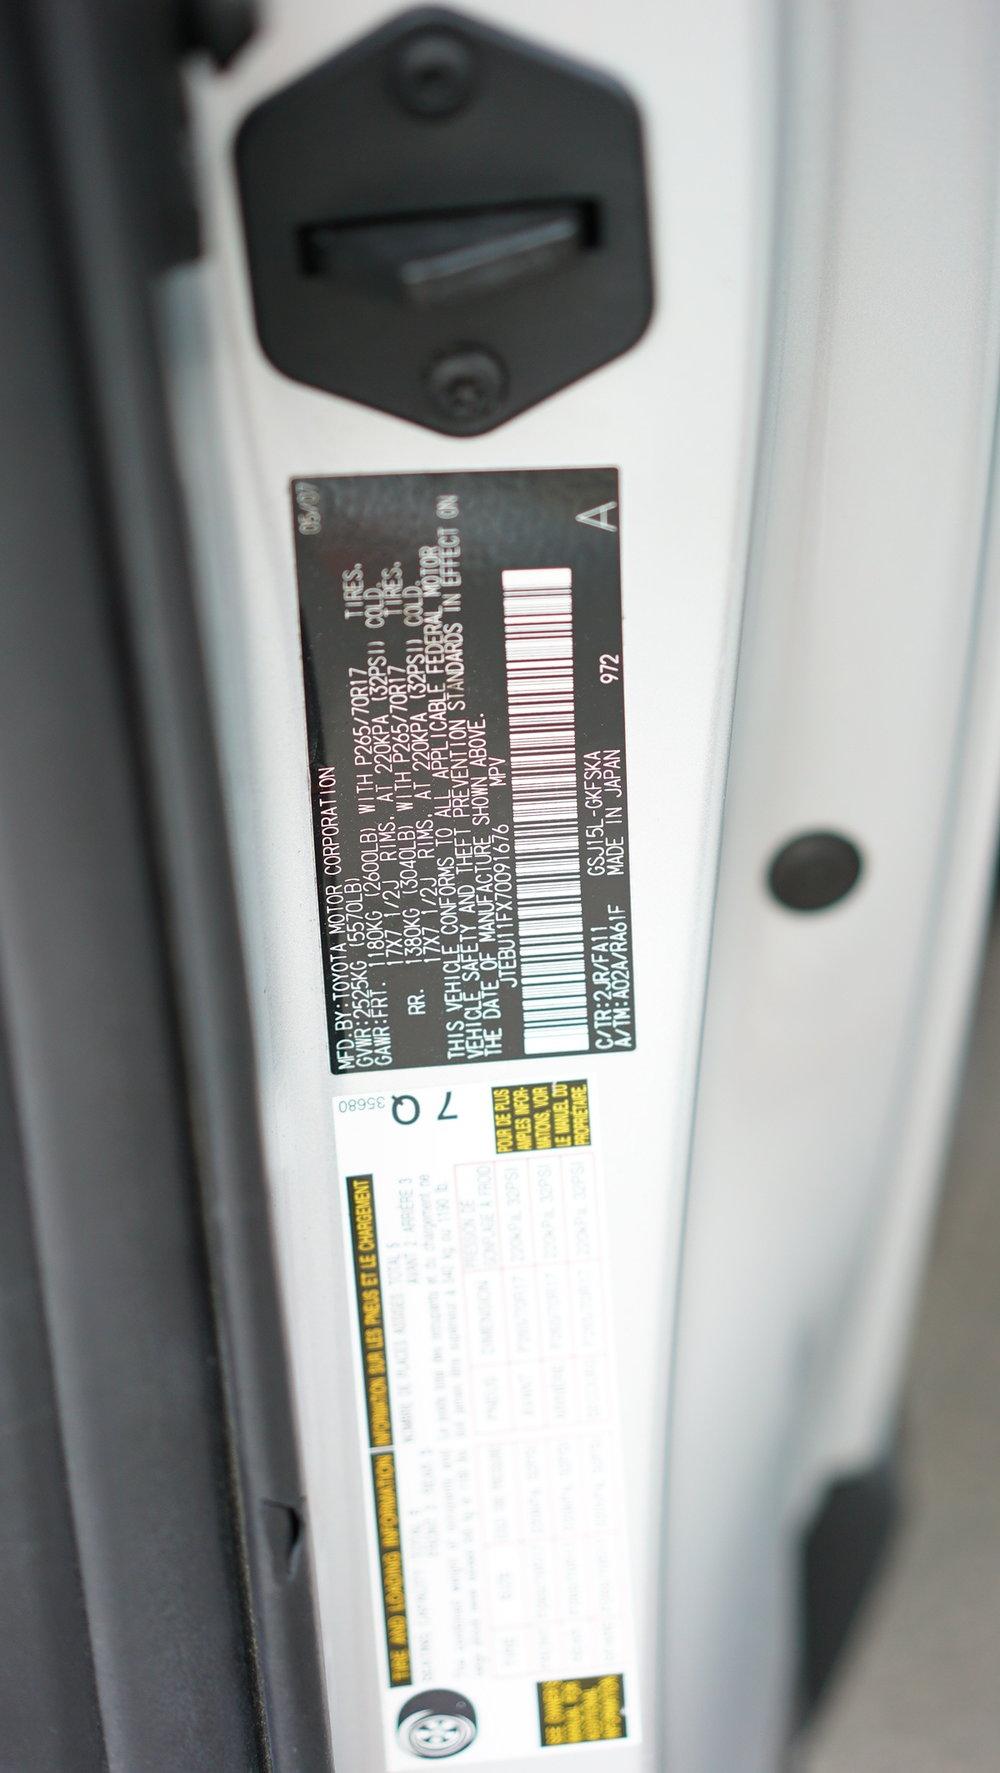 DSC08861.JPG